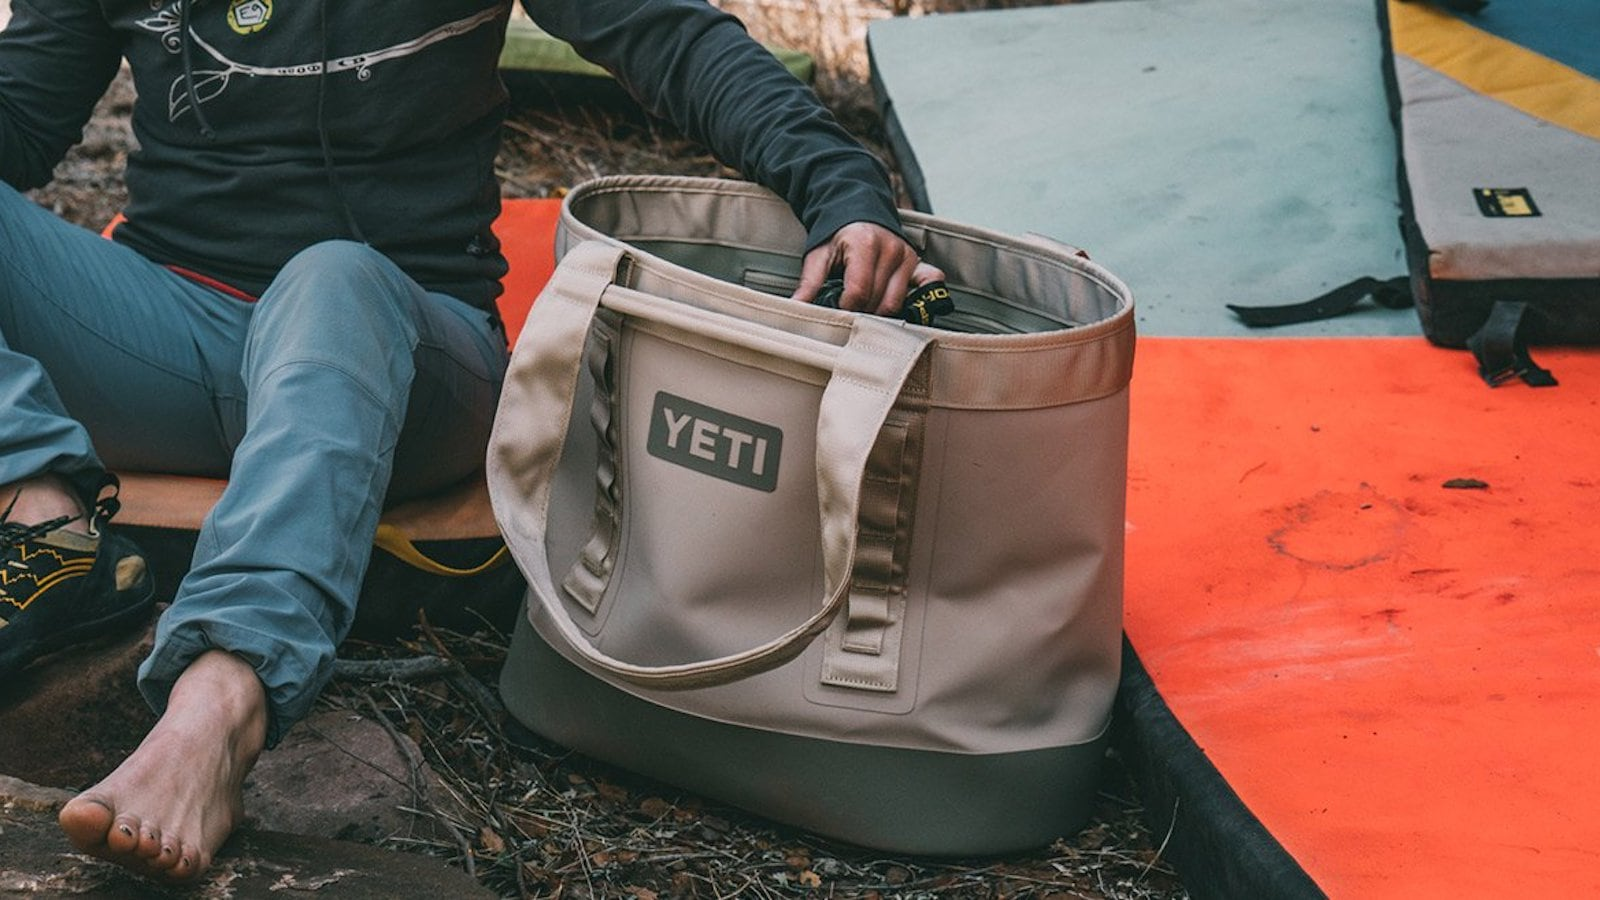 Yeti Camino Carryall All-Purpose Bag